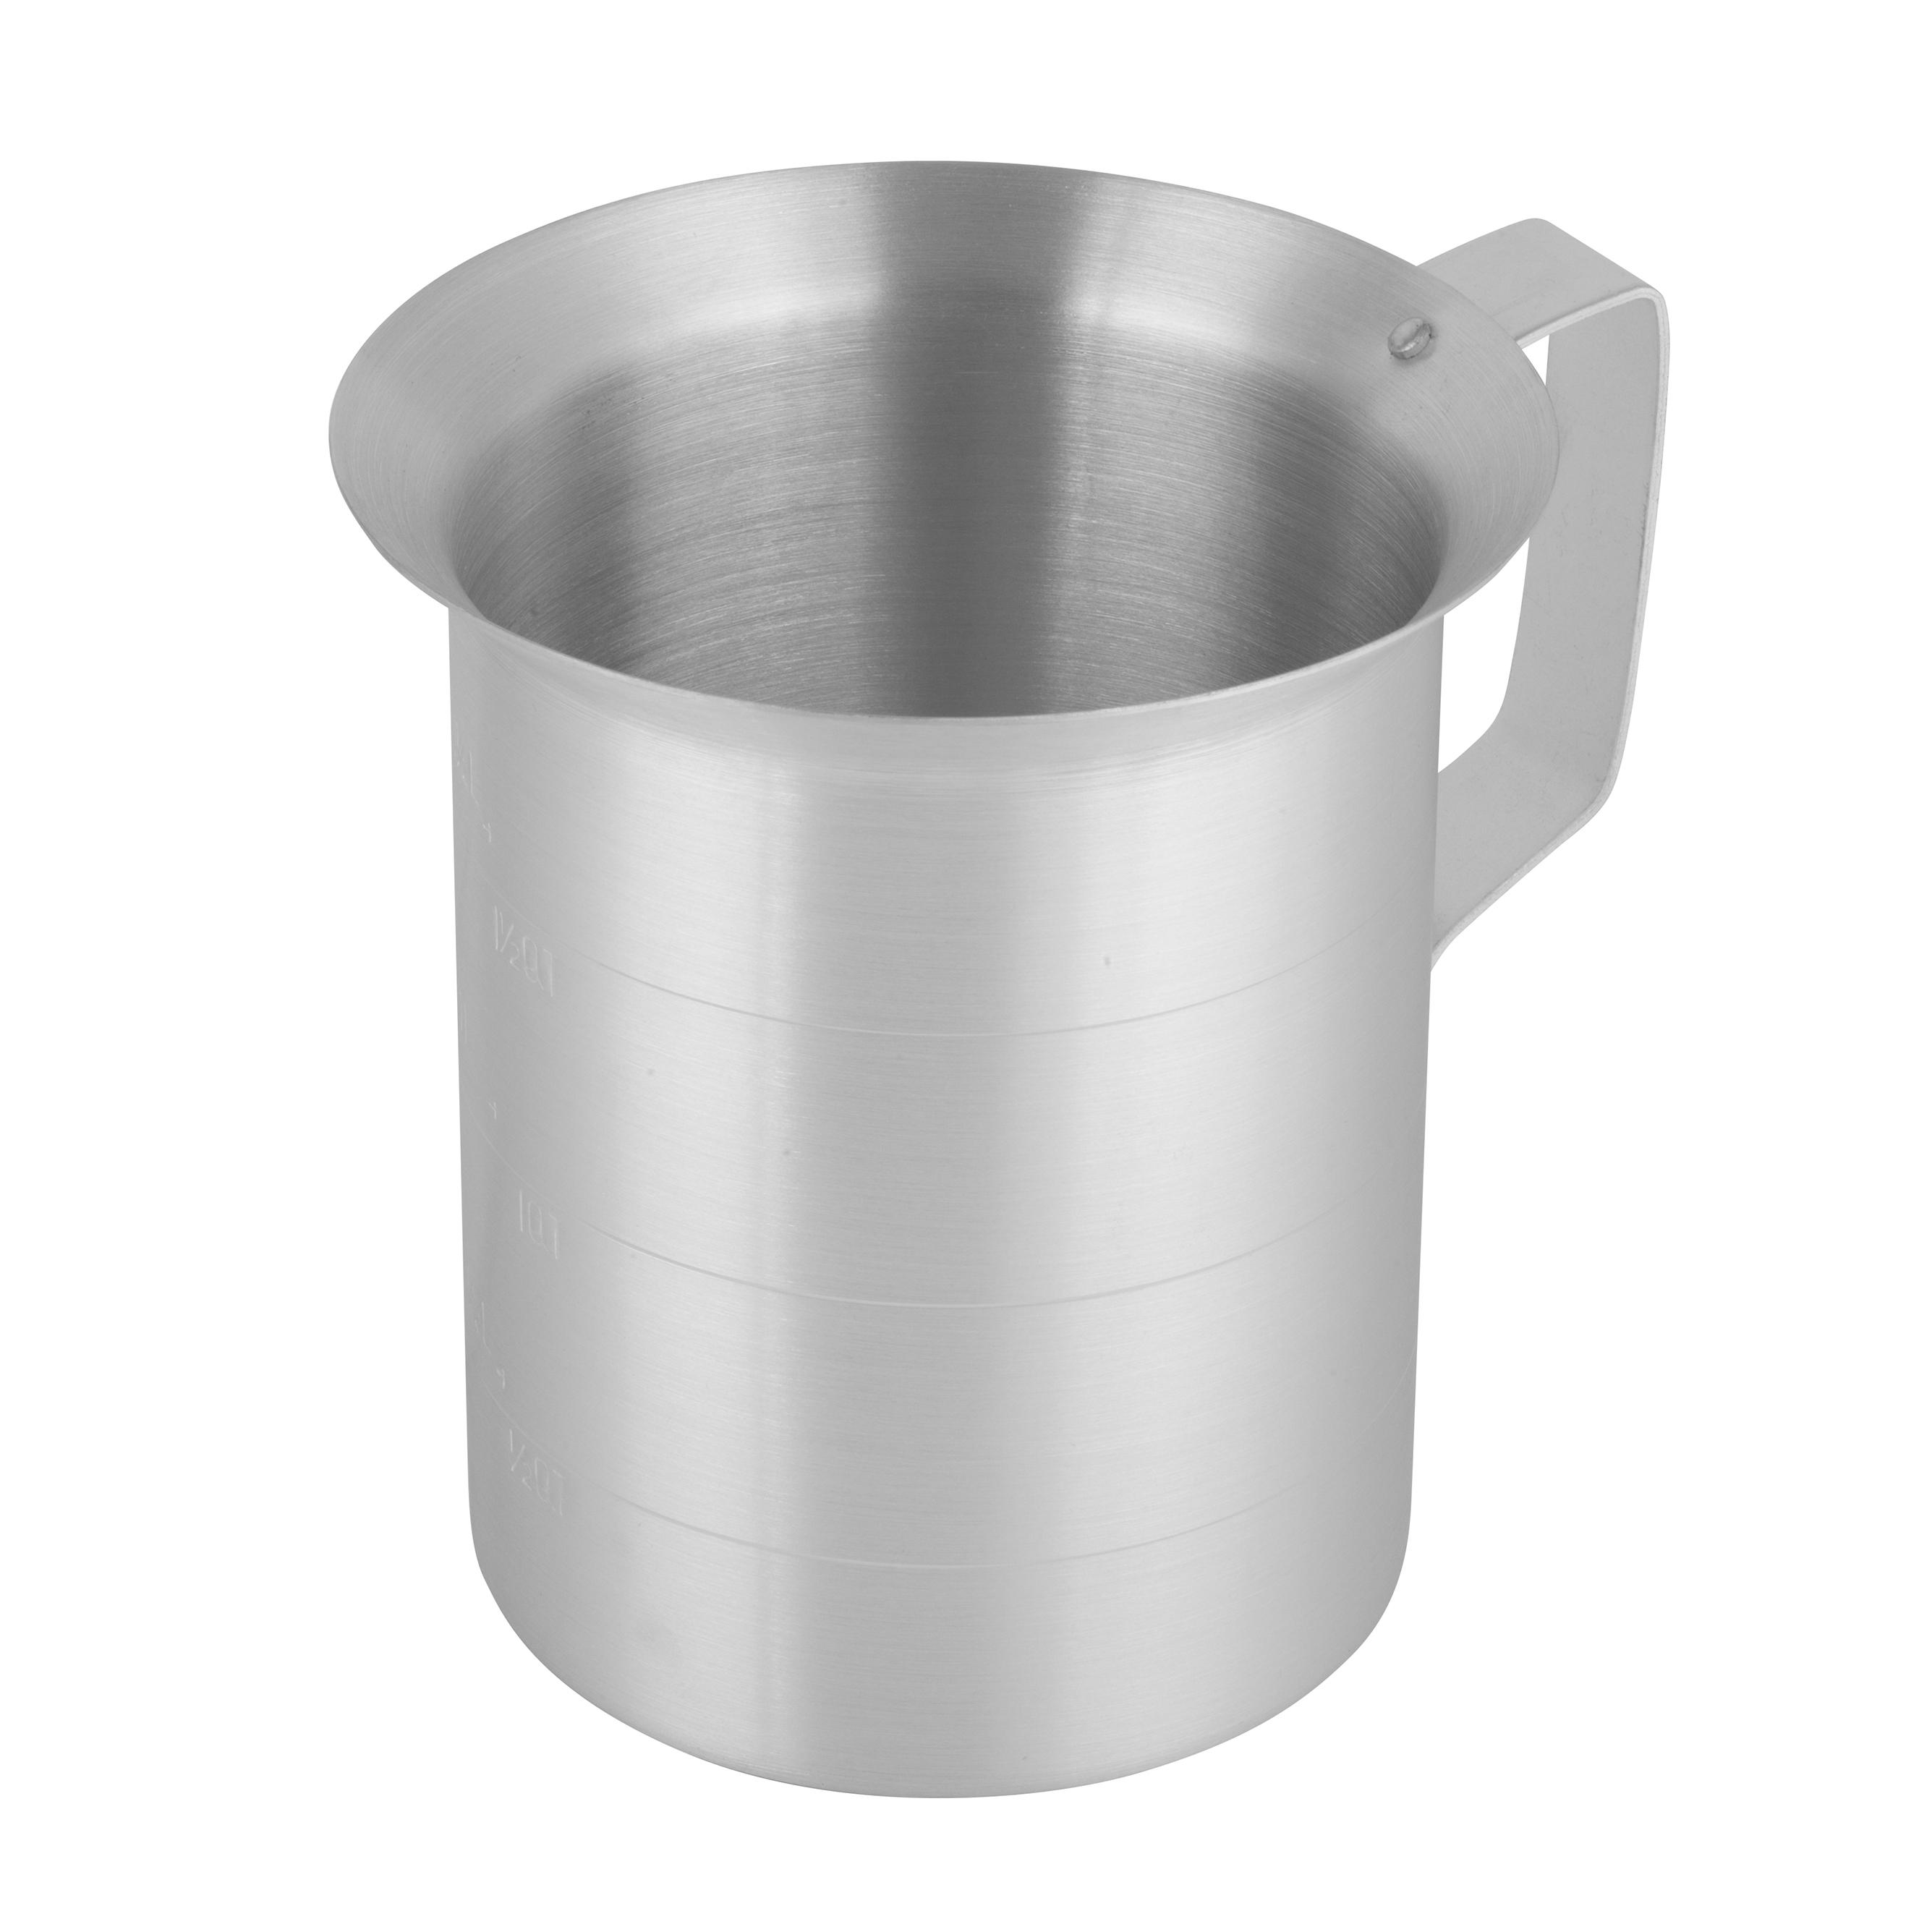 1750-13 Winco AM-2 measuring cups